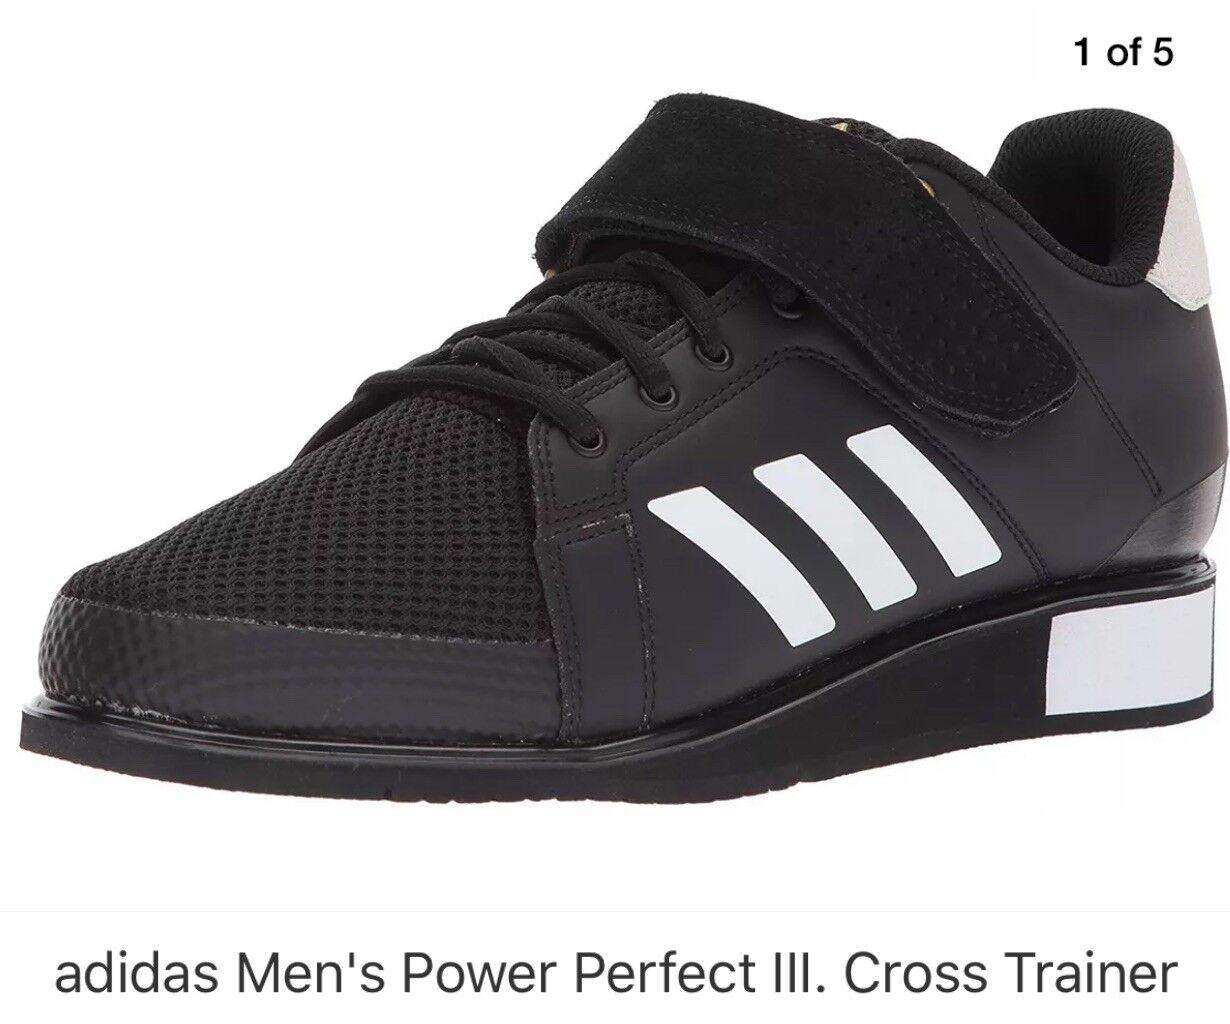 Adidas NEW Leistung Leistung Leistung Stabilizing Weightlifting shoes CQ1770 nk Size 16 fe9f5a